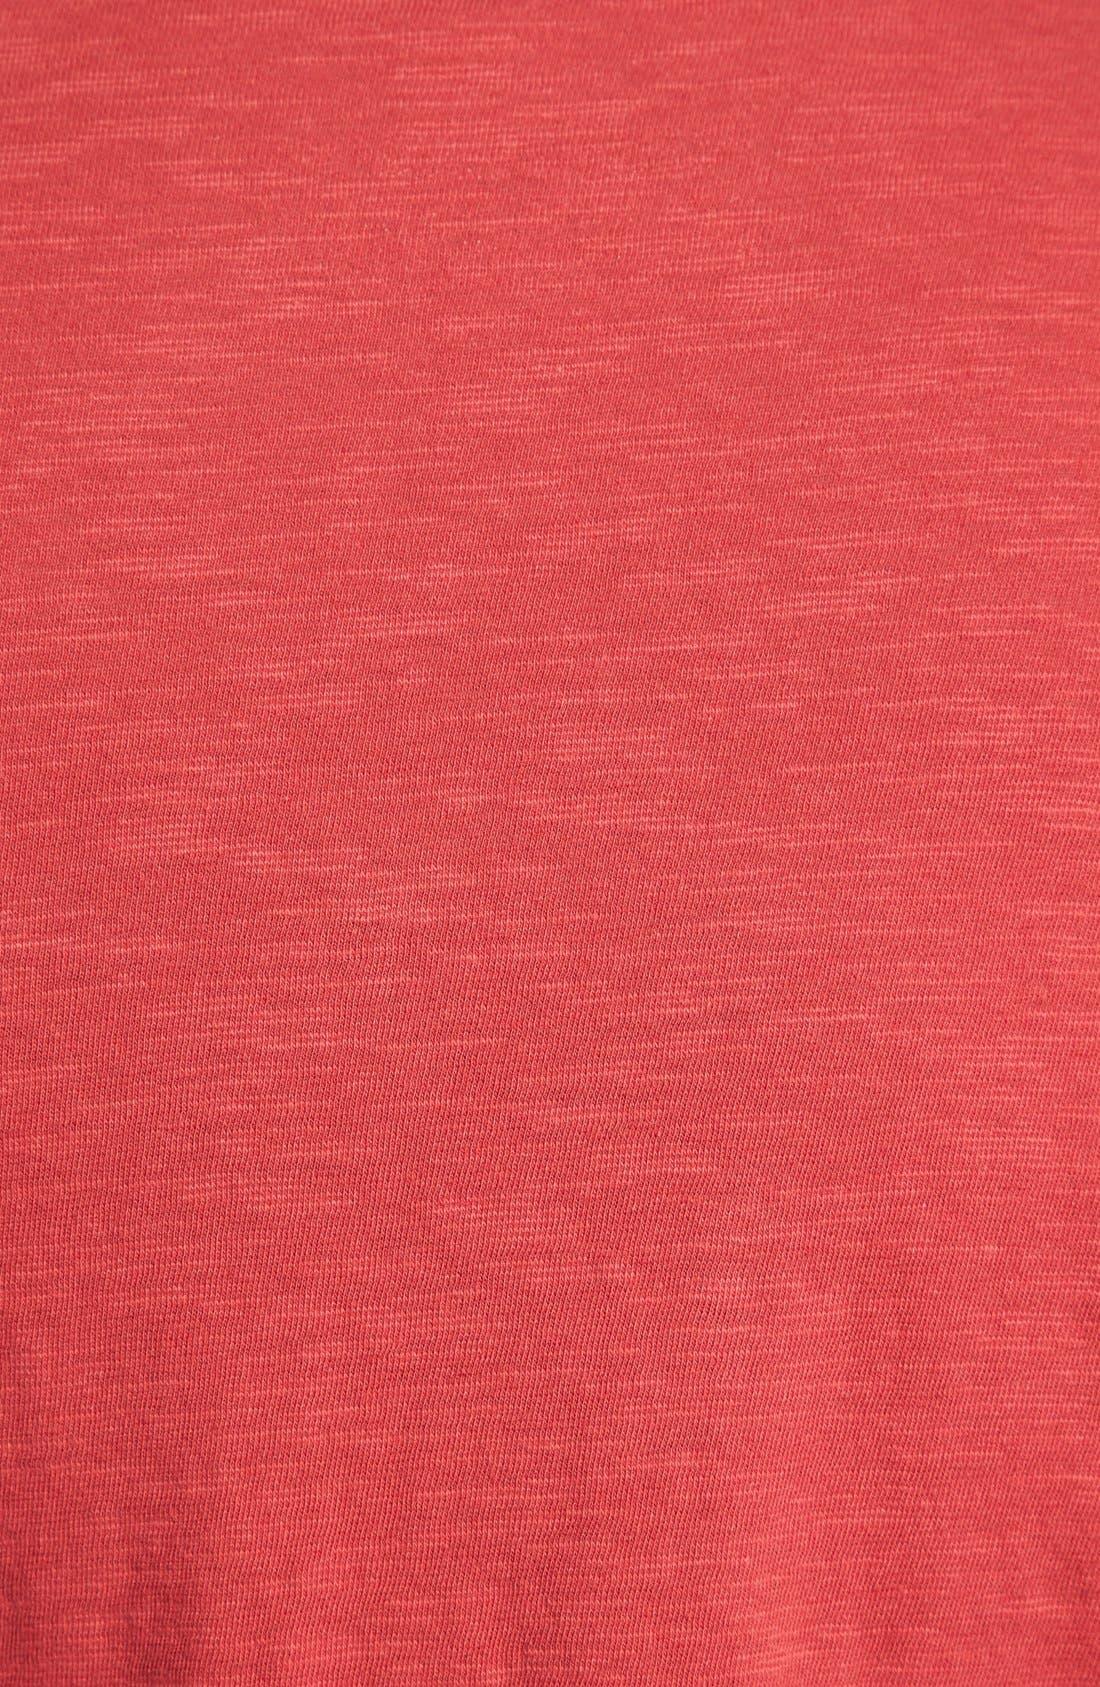 Alternate Image 3  - 47 Brand 'New England Patriots - Scrum' Graphic T-Shirt